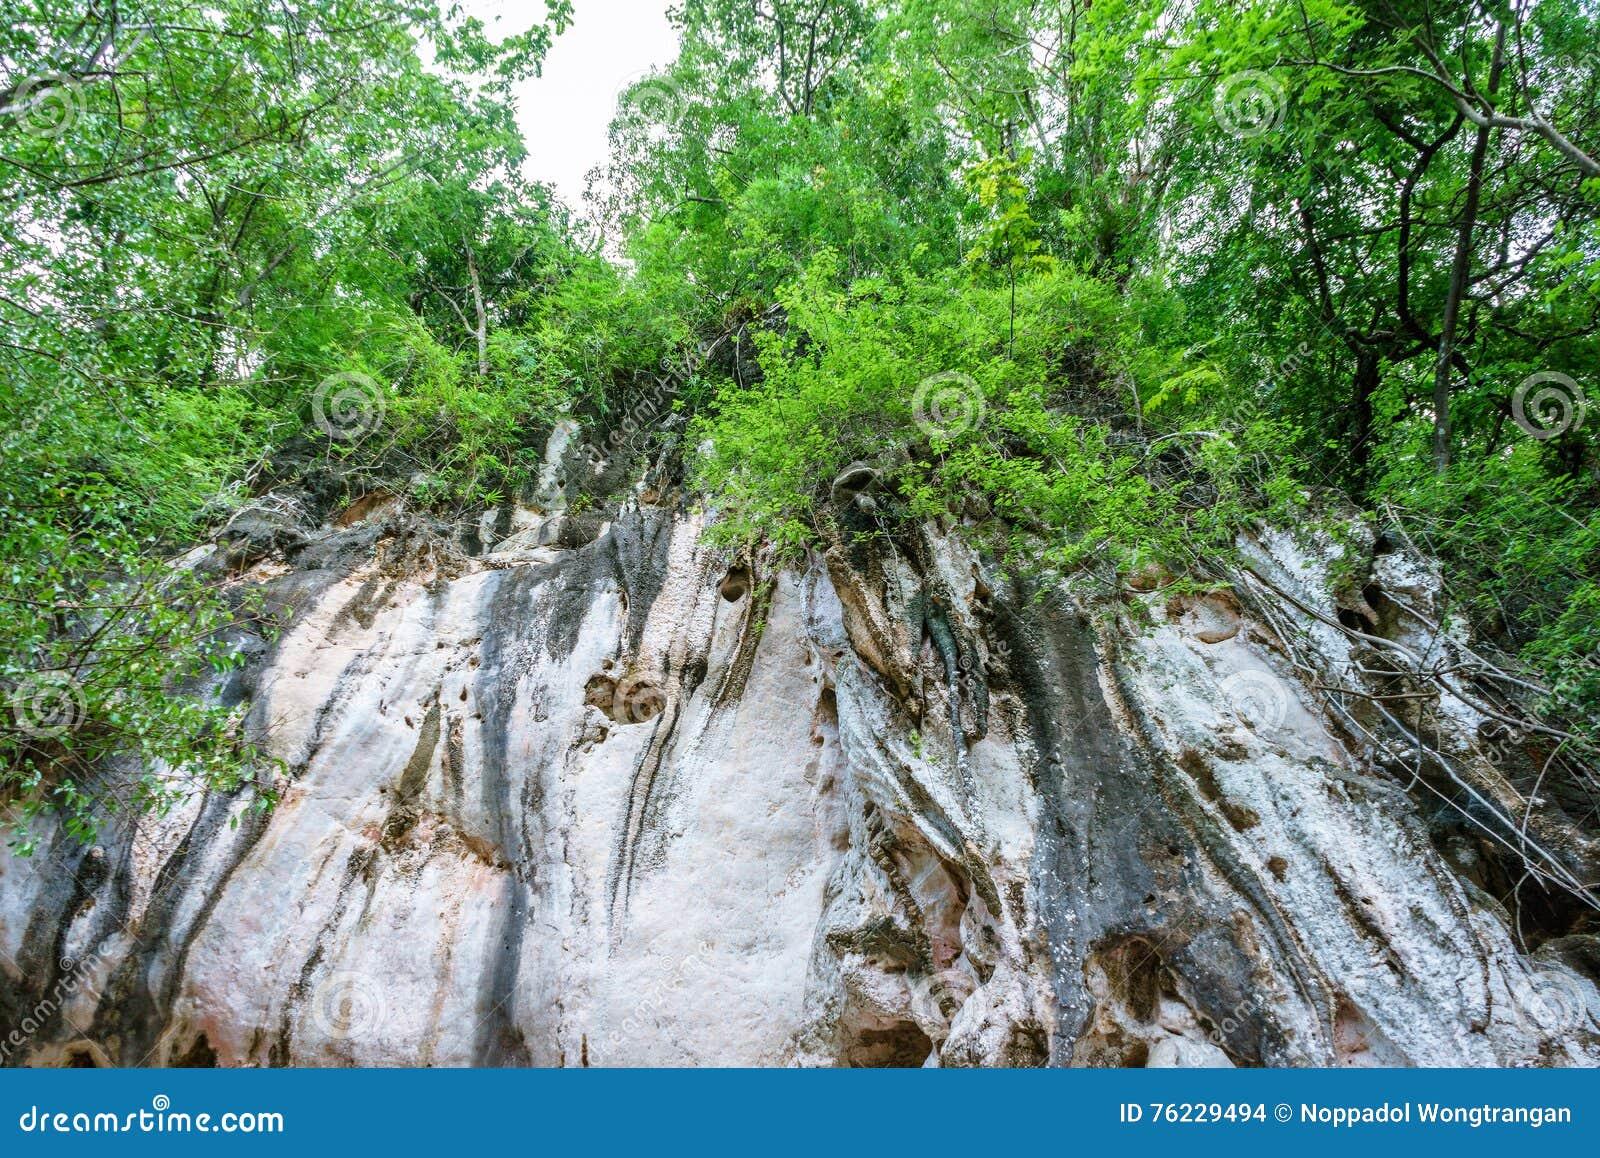 Hohe felsige Klippe im Wald